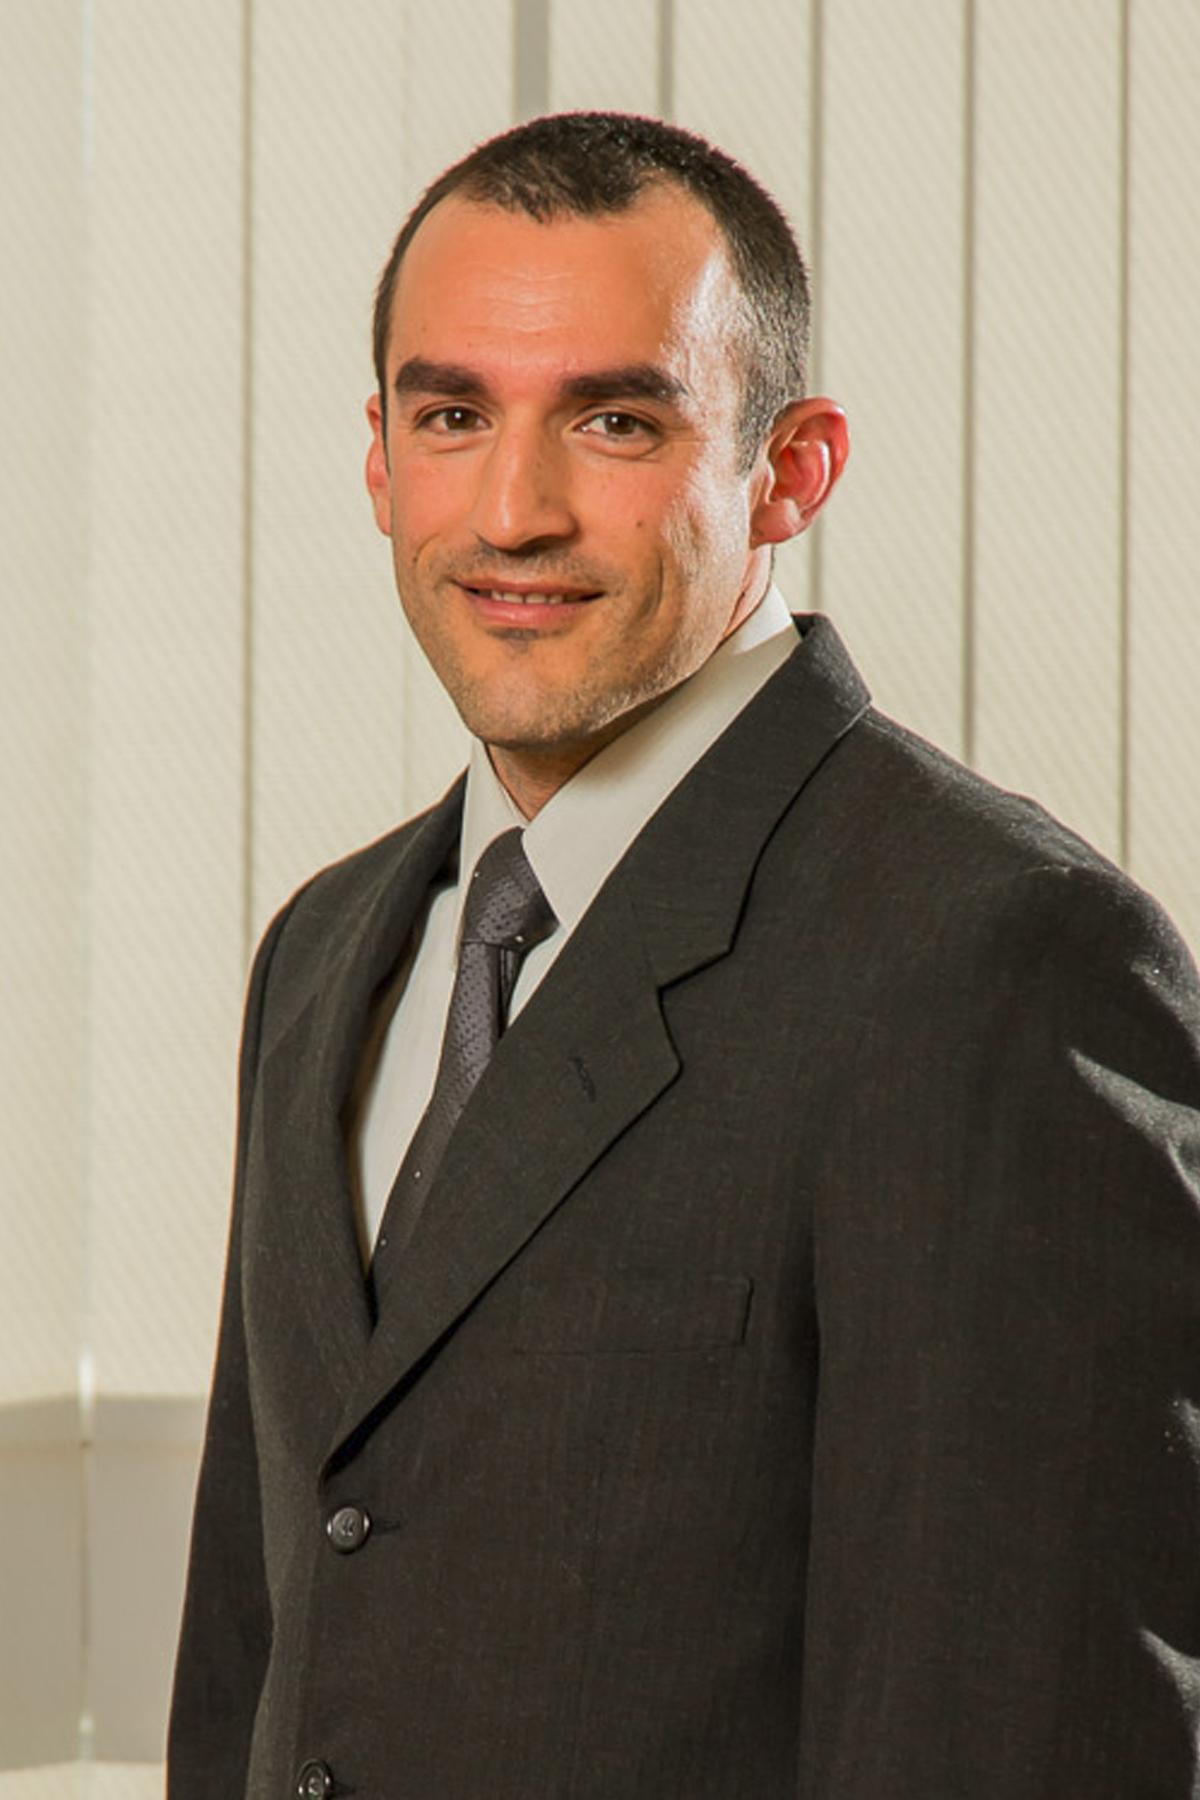 Gaston Becerra